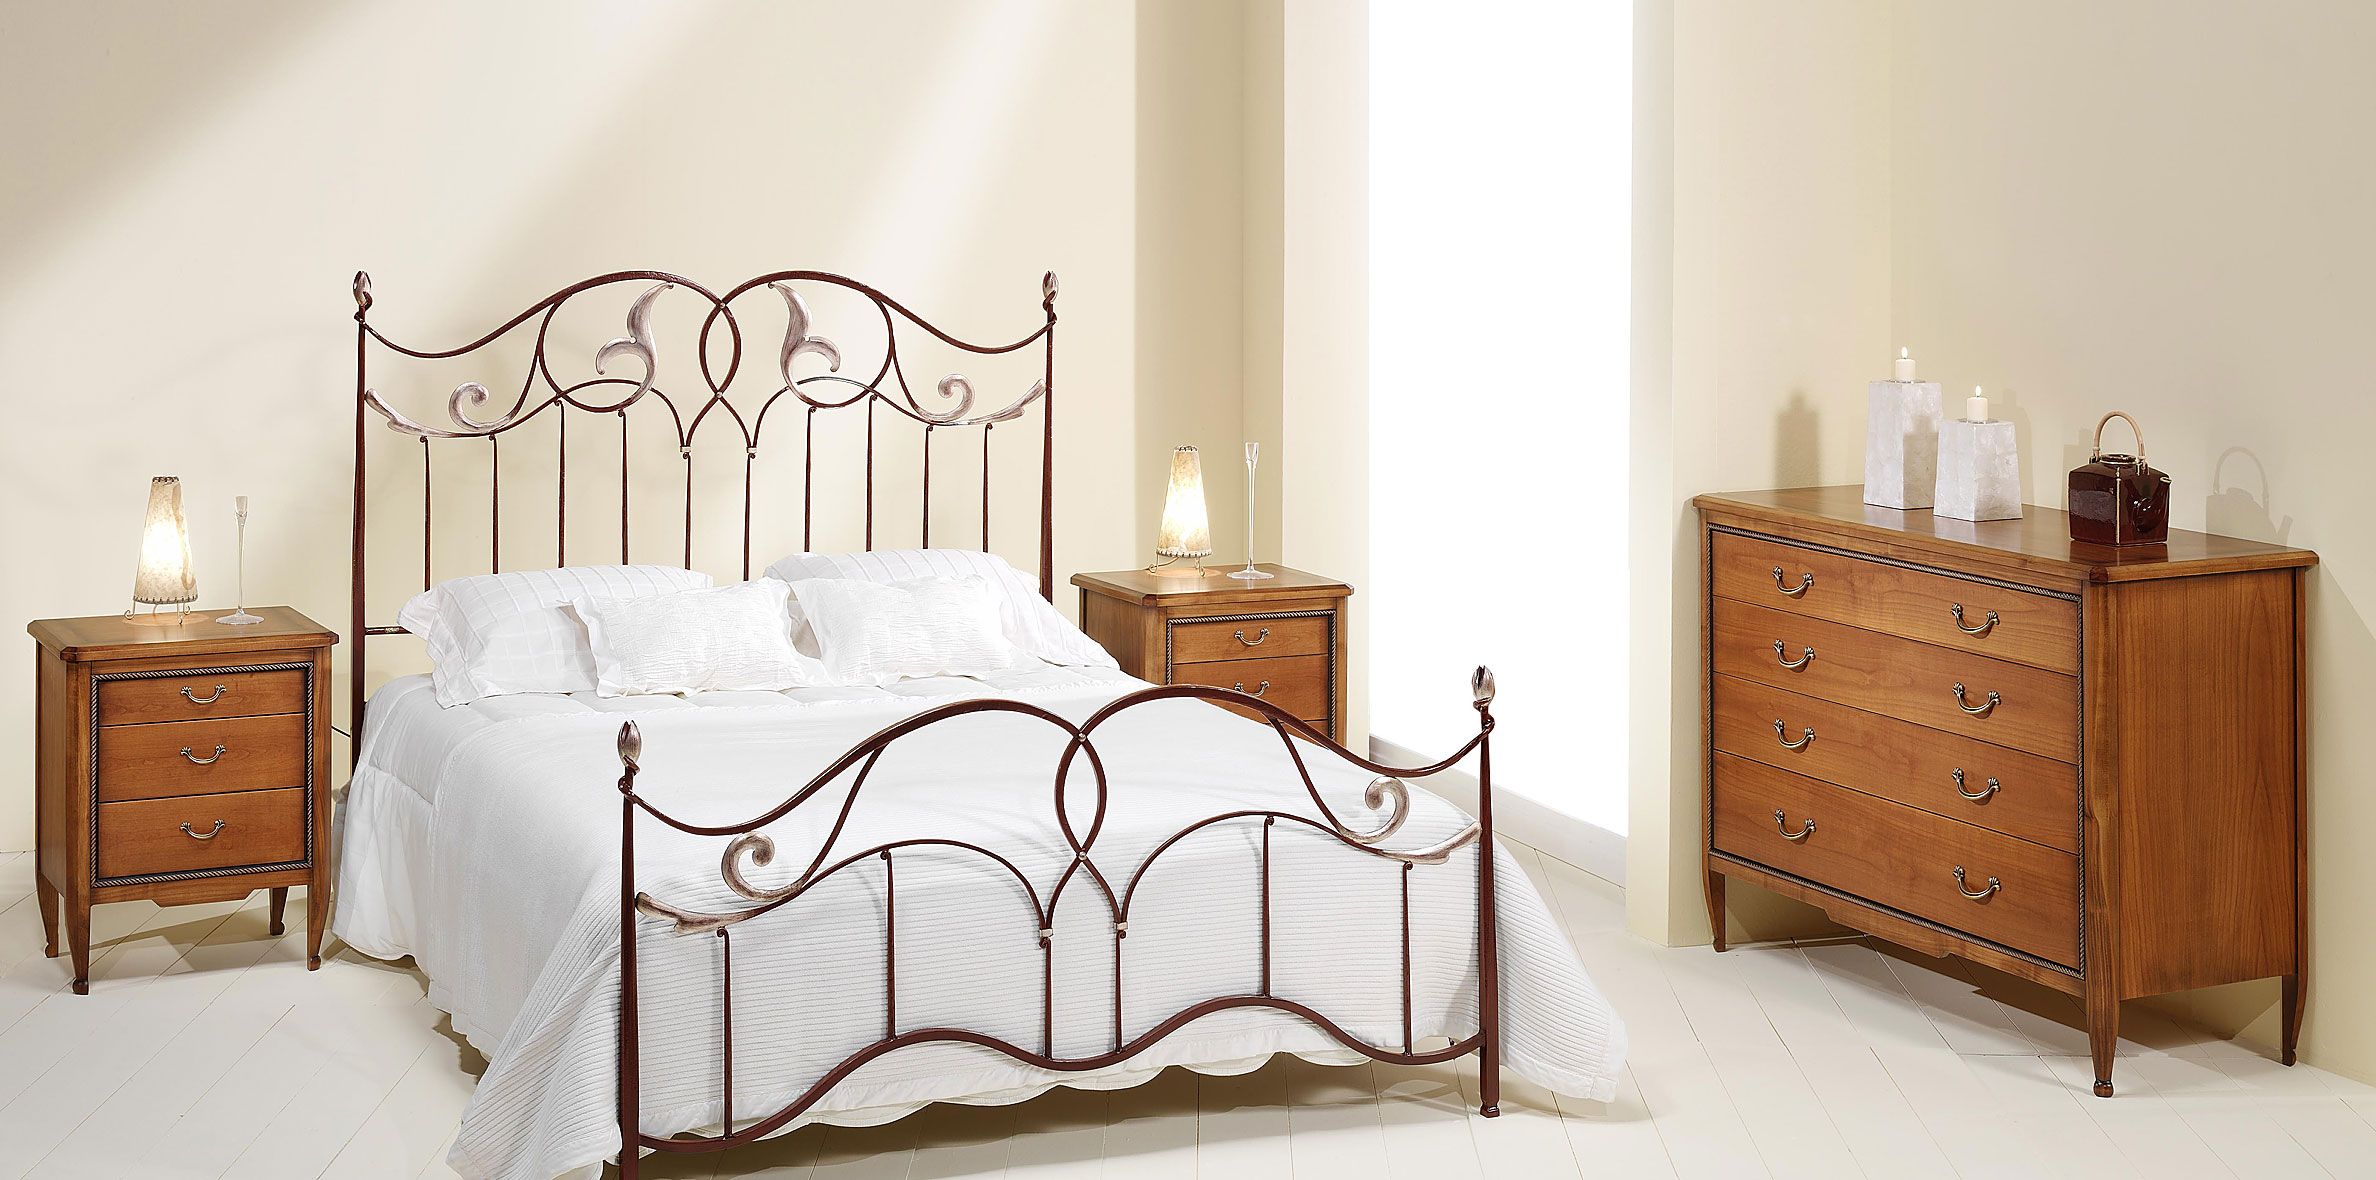 Dormitorio forja caroli en - Muebles en forja ...